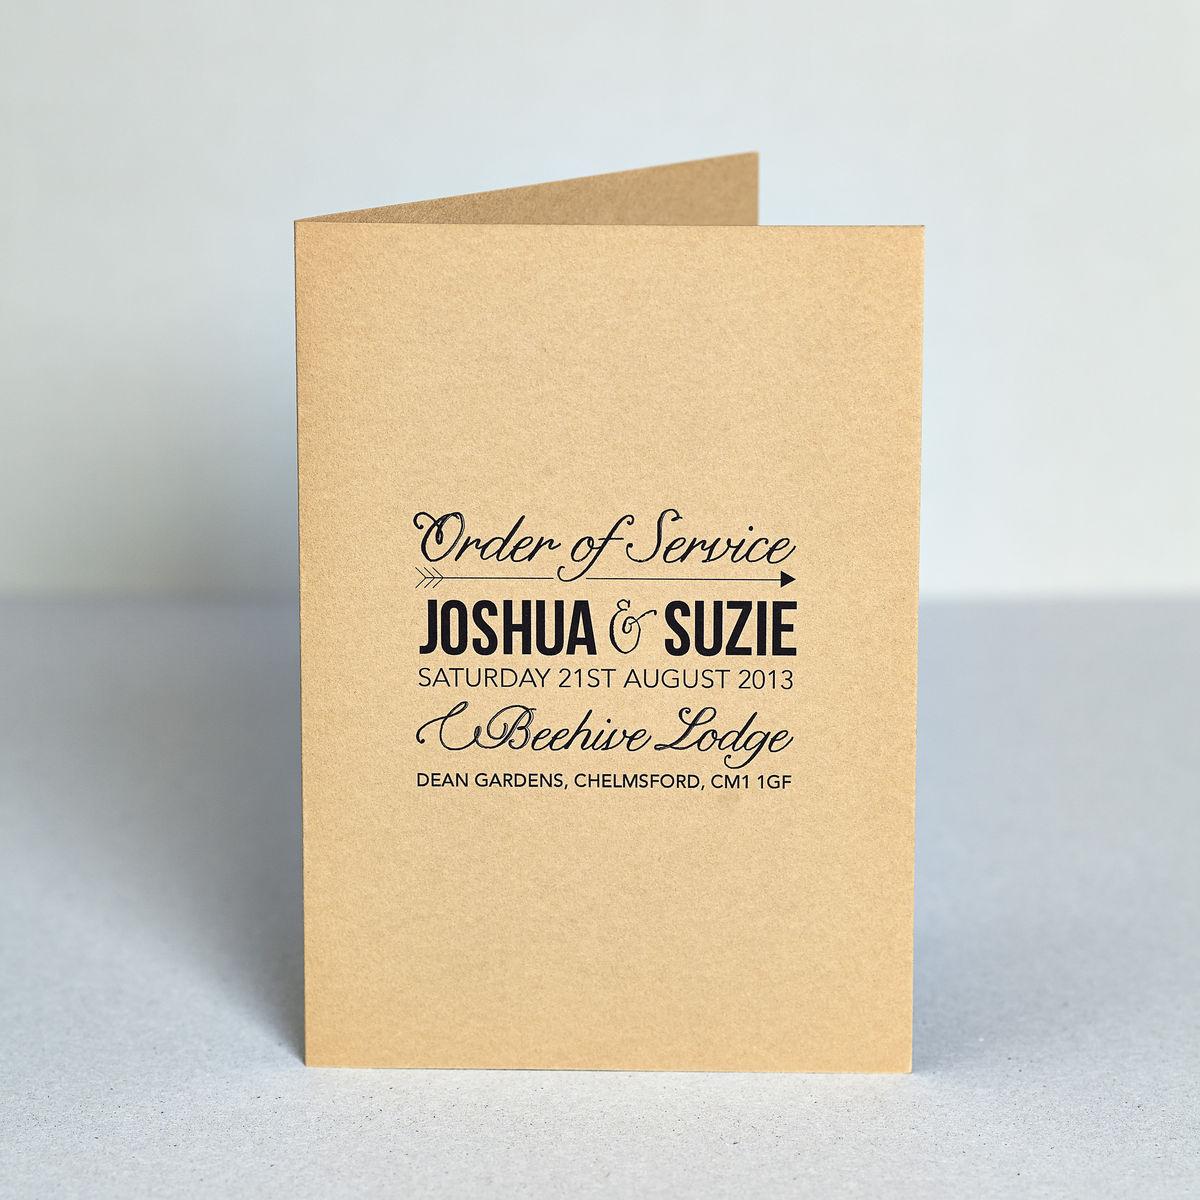 Woodland Wedding Invitations was best invitations example